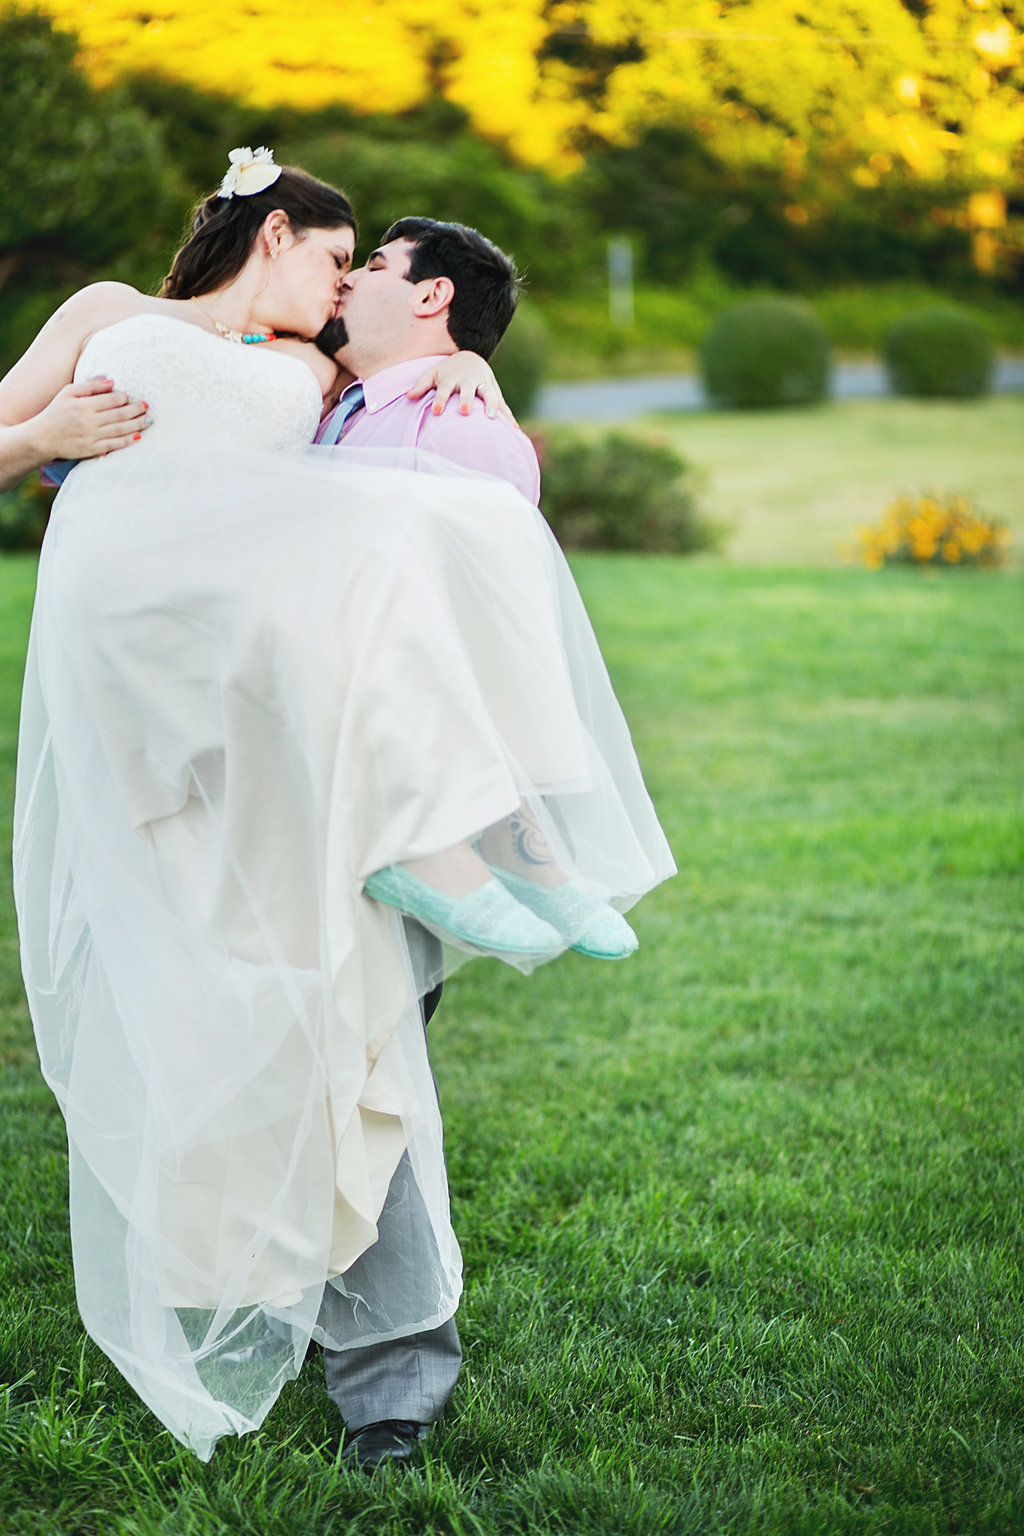 Laura + Matt Featured DIY Wedding // The Overwhelmed Bride Bridal Lifestyle + Wedding Blog // Wedding Photography